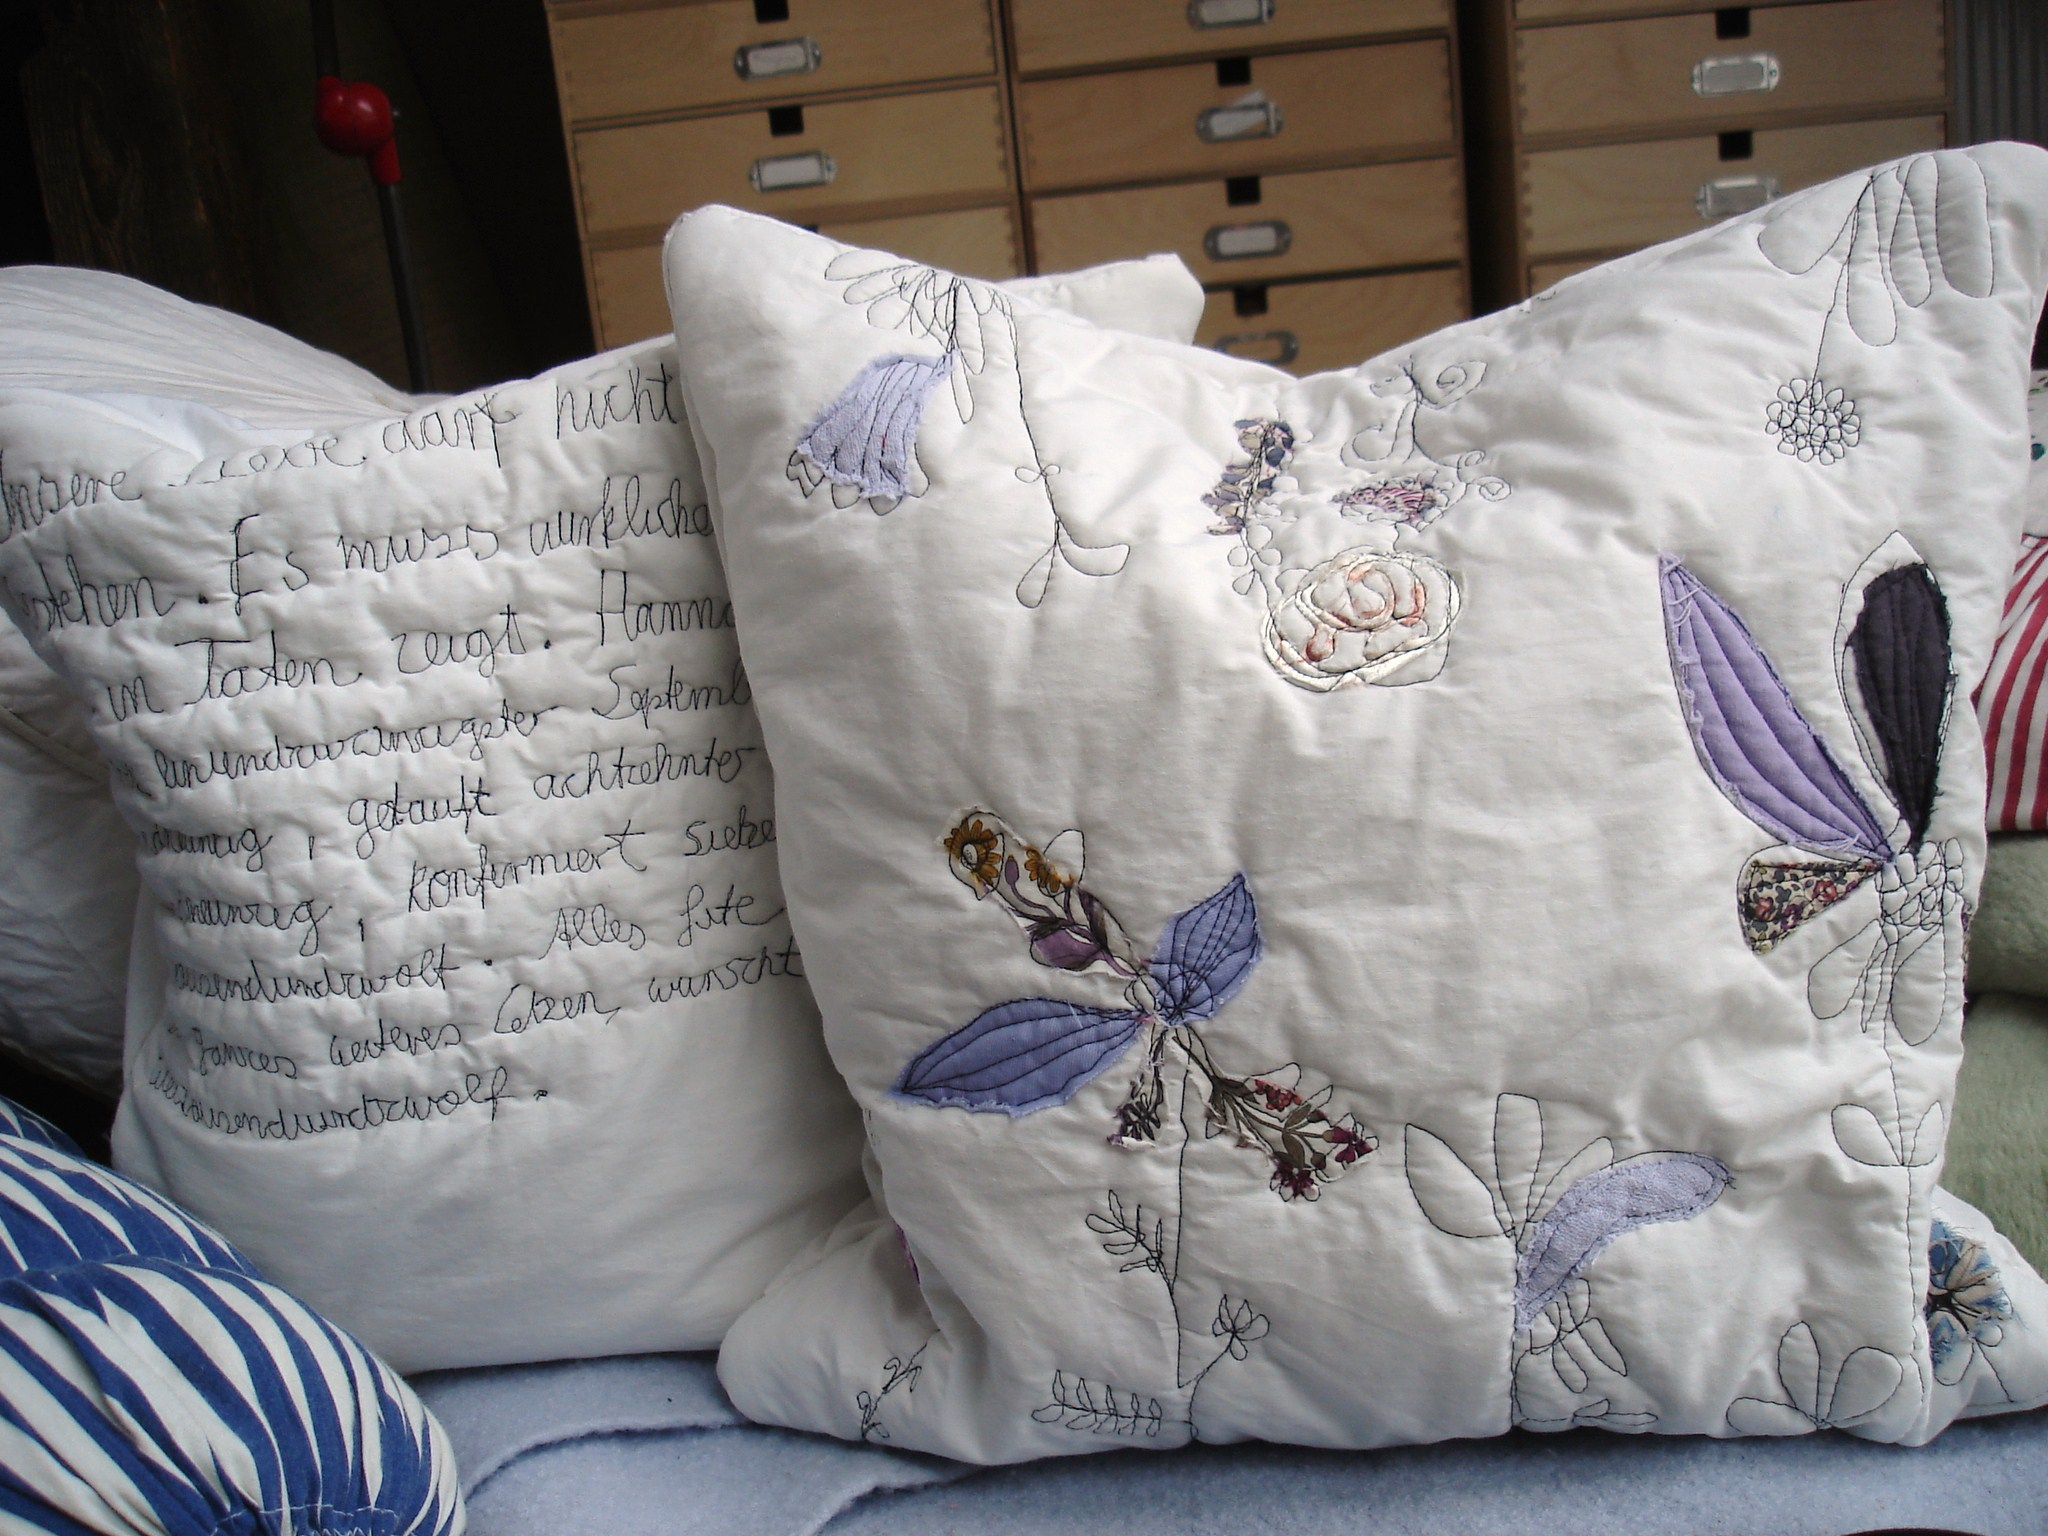 dsc05960 textile geschichten. Black Bedroom Furniture Sets. Home Design Ideas